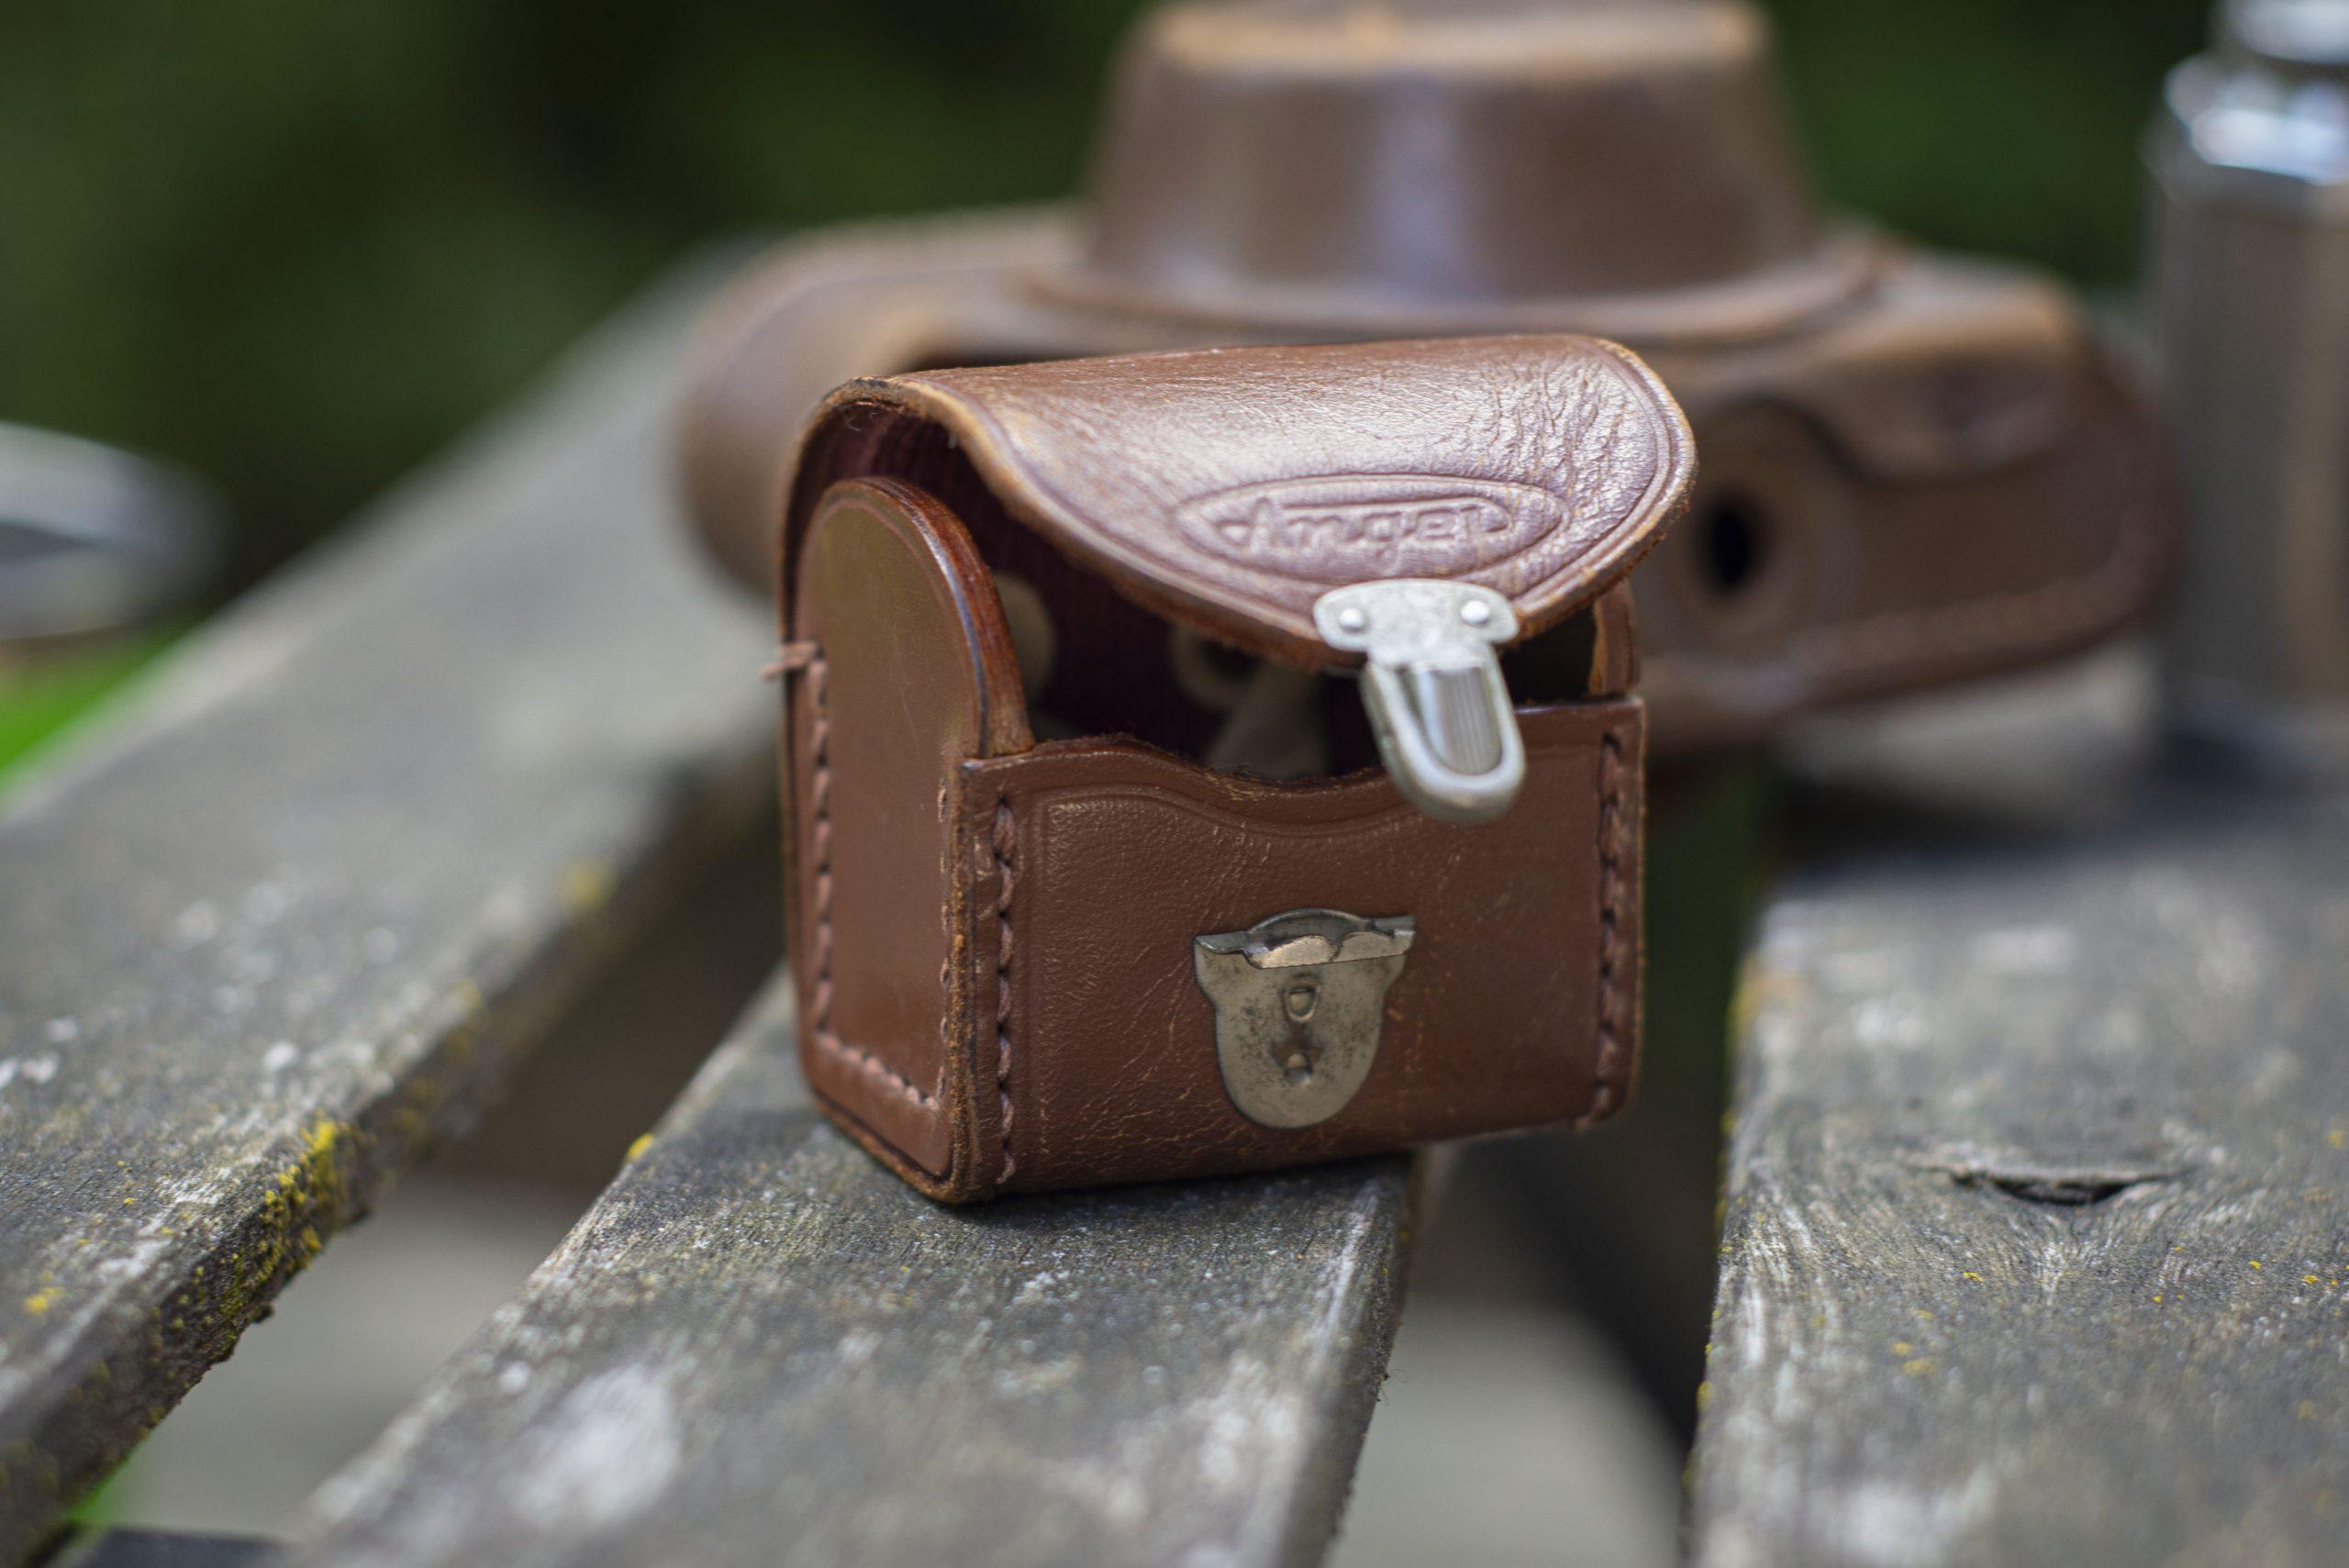 Gelto accessory case